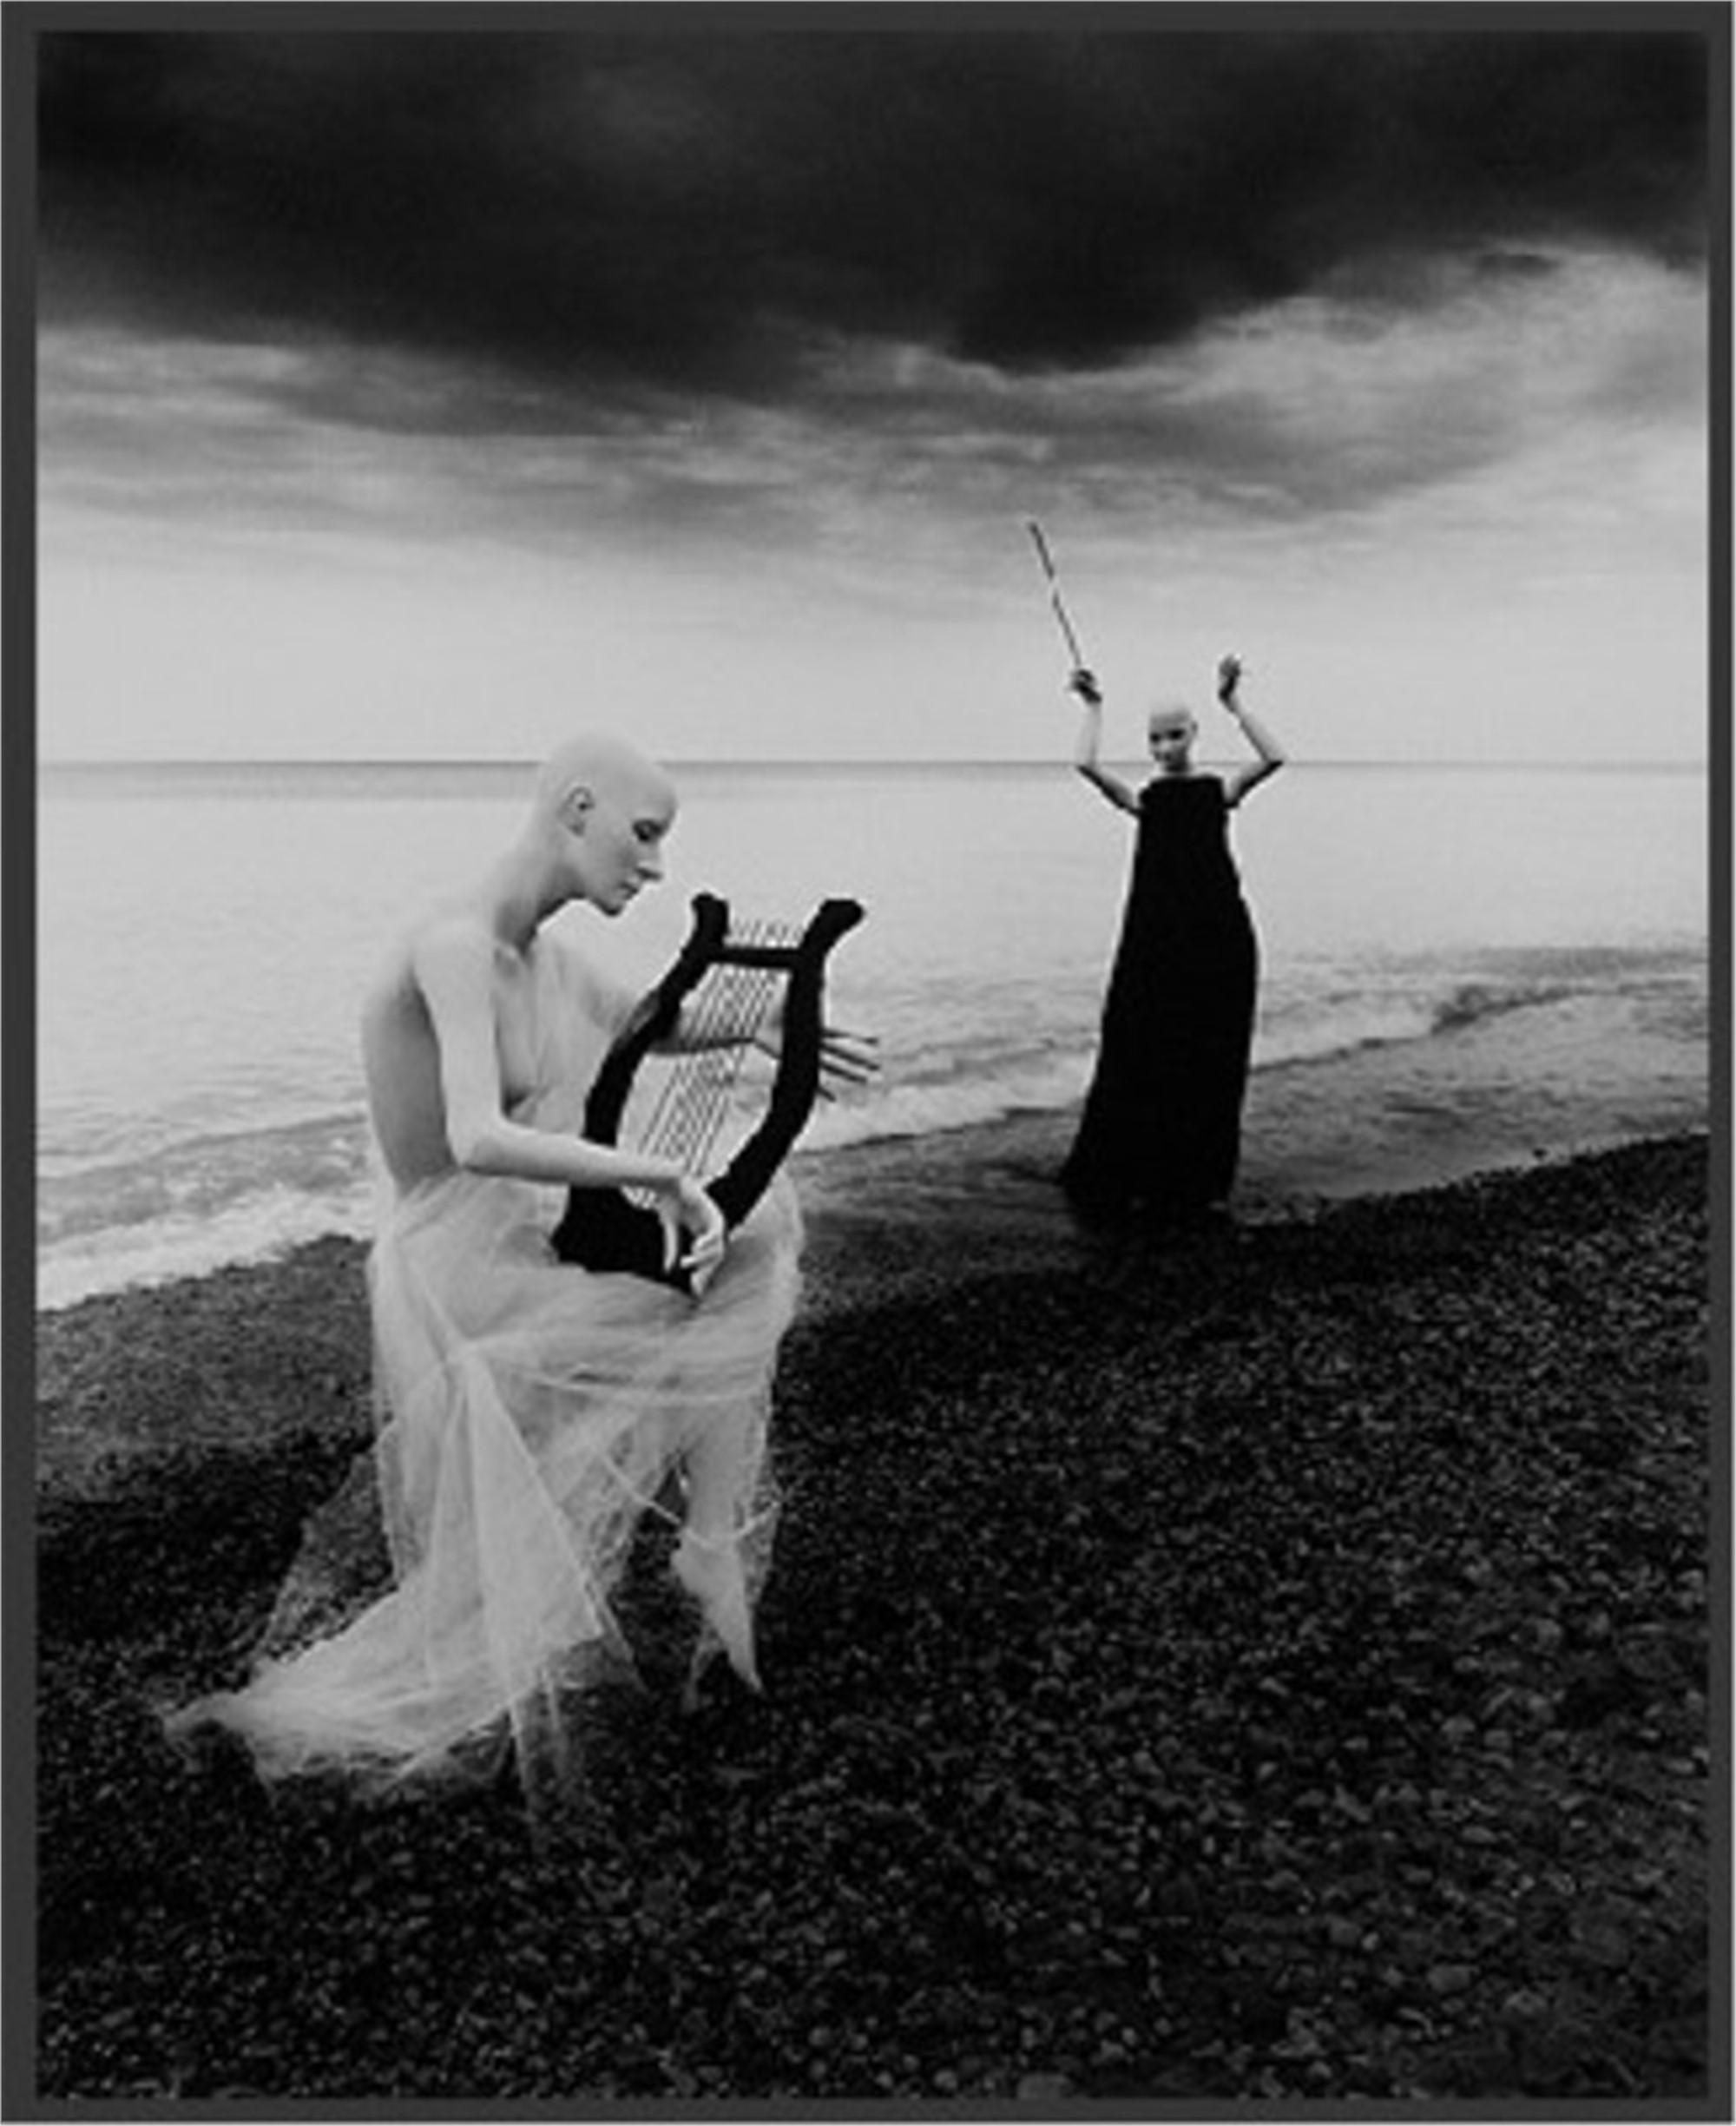 Inspiration in Black by Misha Gordin